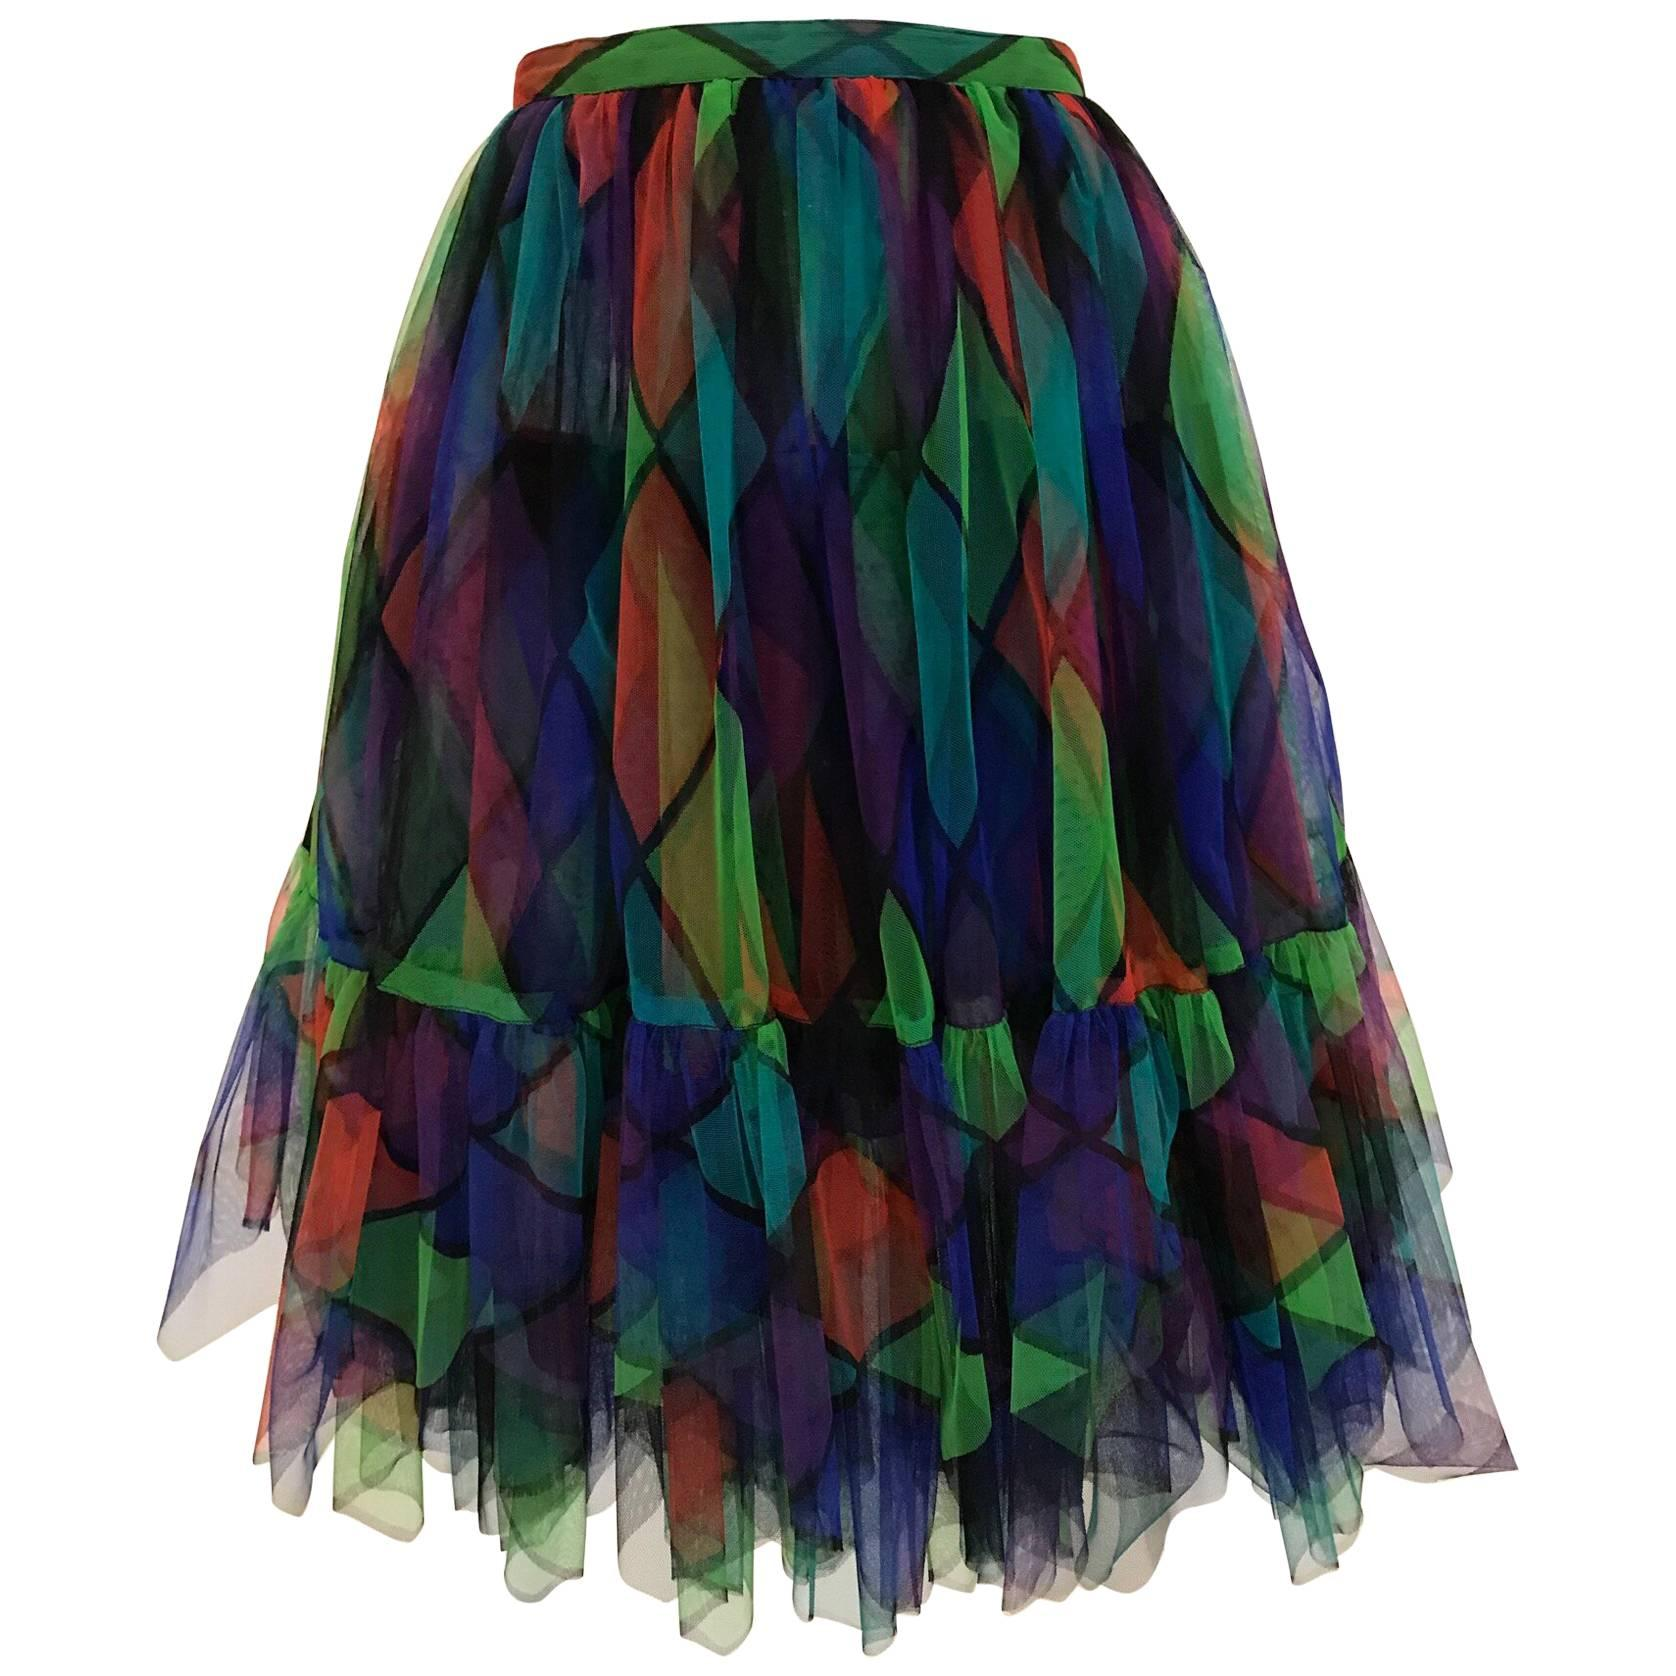 Vintage Saint Laurent Green and Red Harlequin Print Tulle Skirt